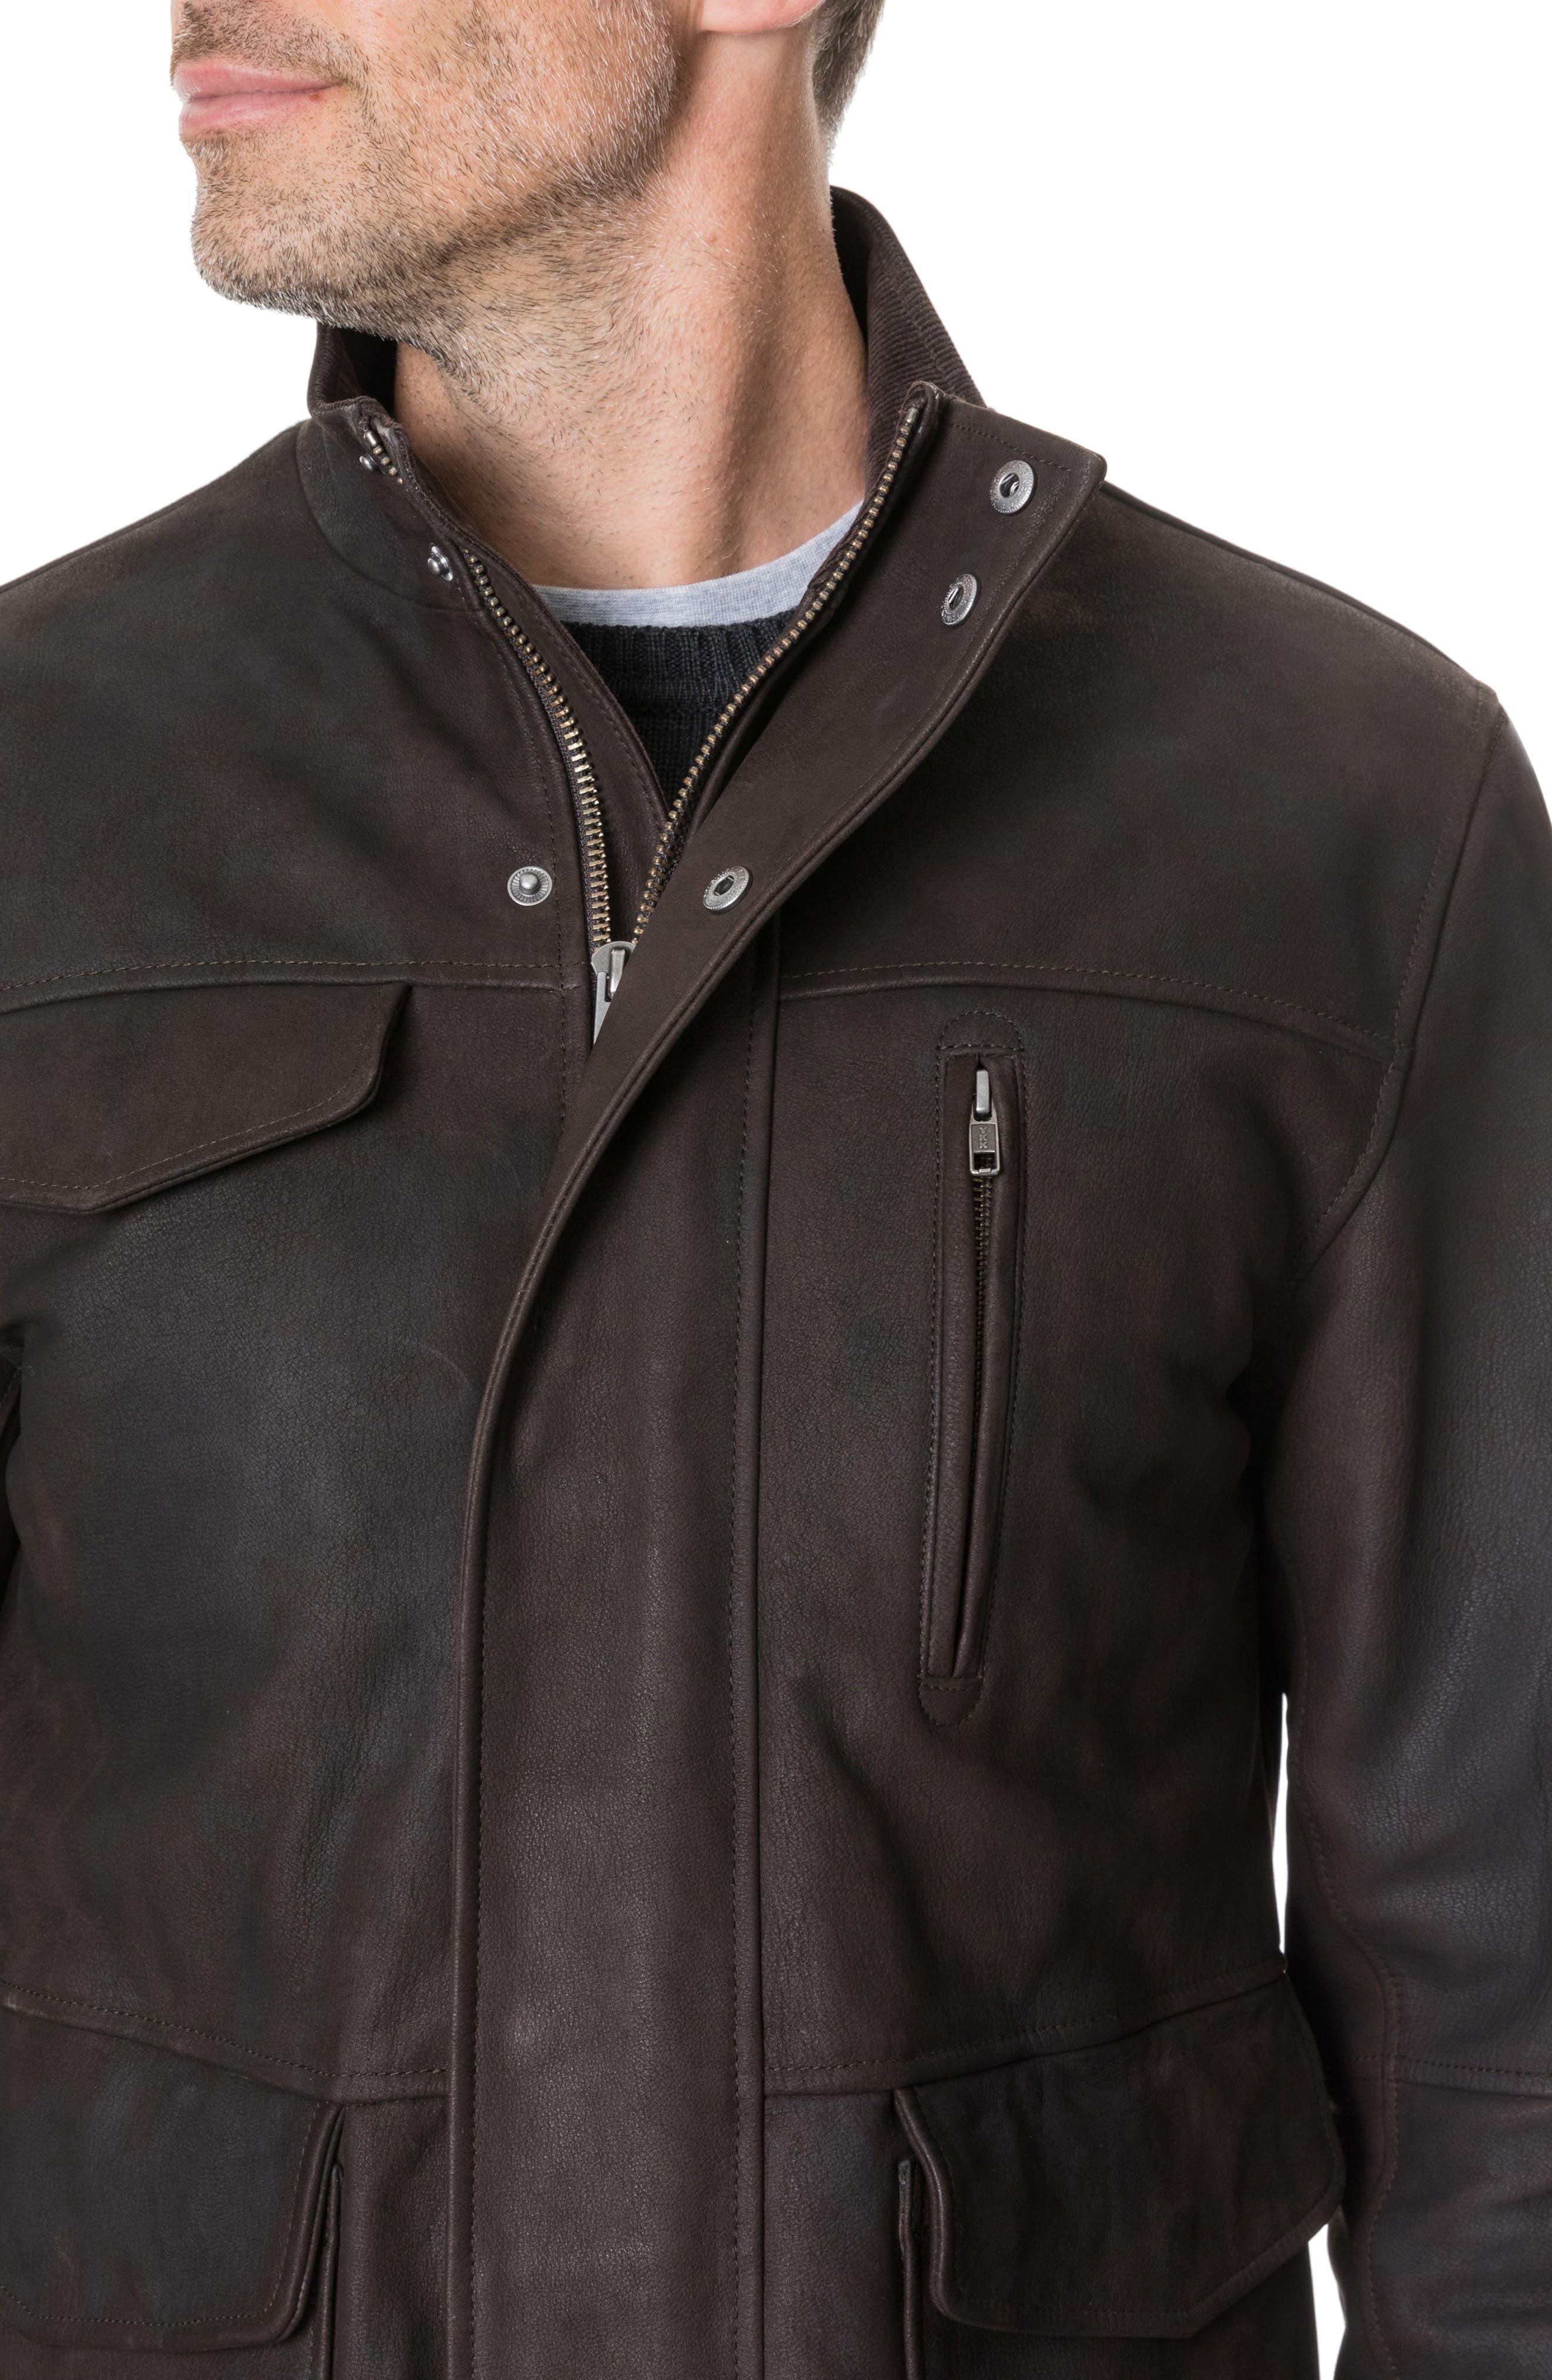 Fairholme Leather Jacket,                             Alternate thumbnail 3, color,                             CHOCOLATE